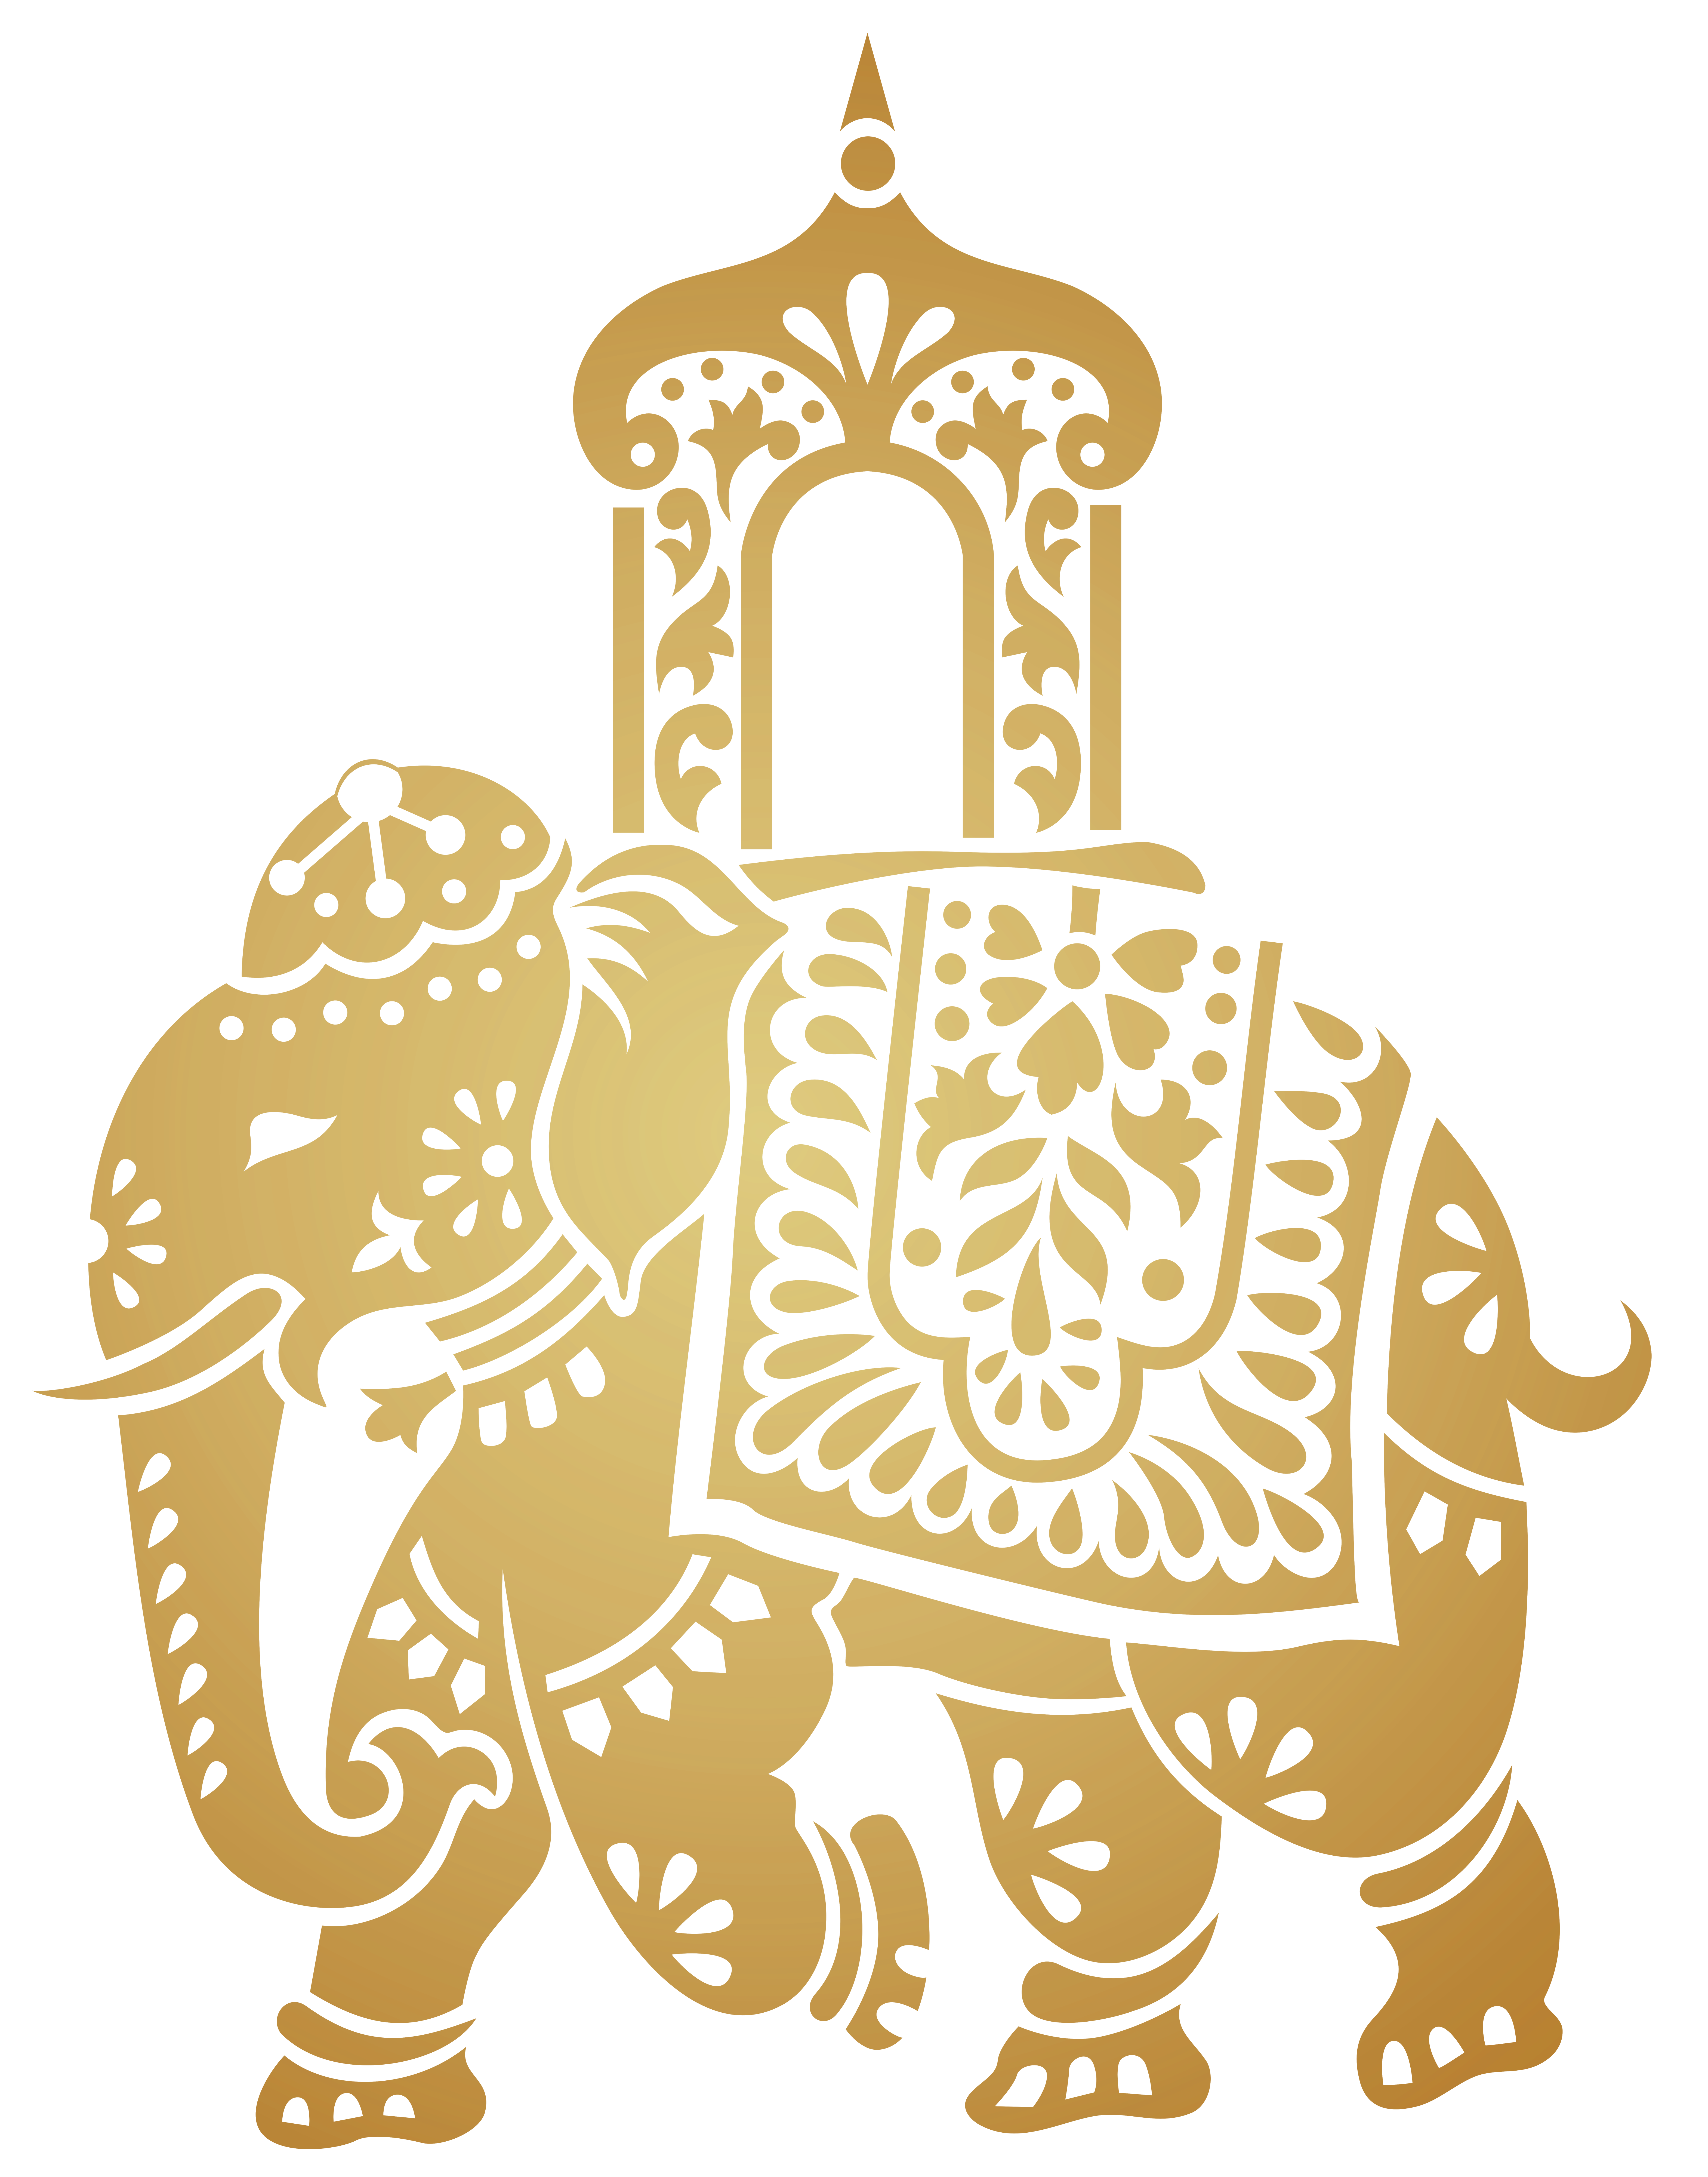 Halloween elephants clipart jpg free library Decorative Indian Elephant Transparent Clip Art Image jpg free library